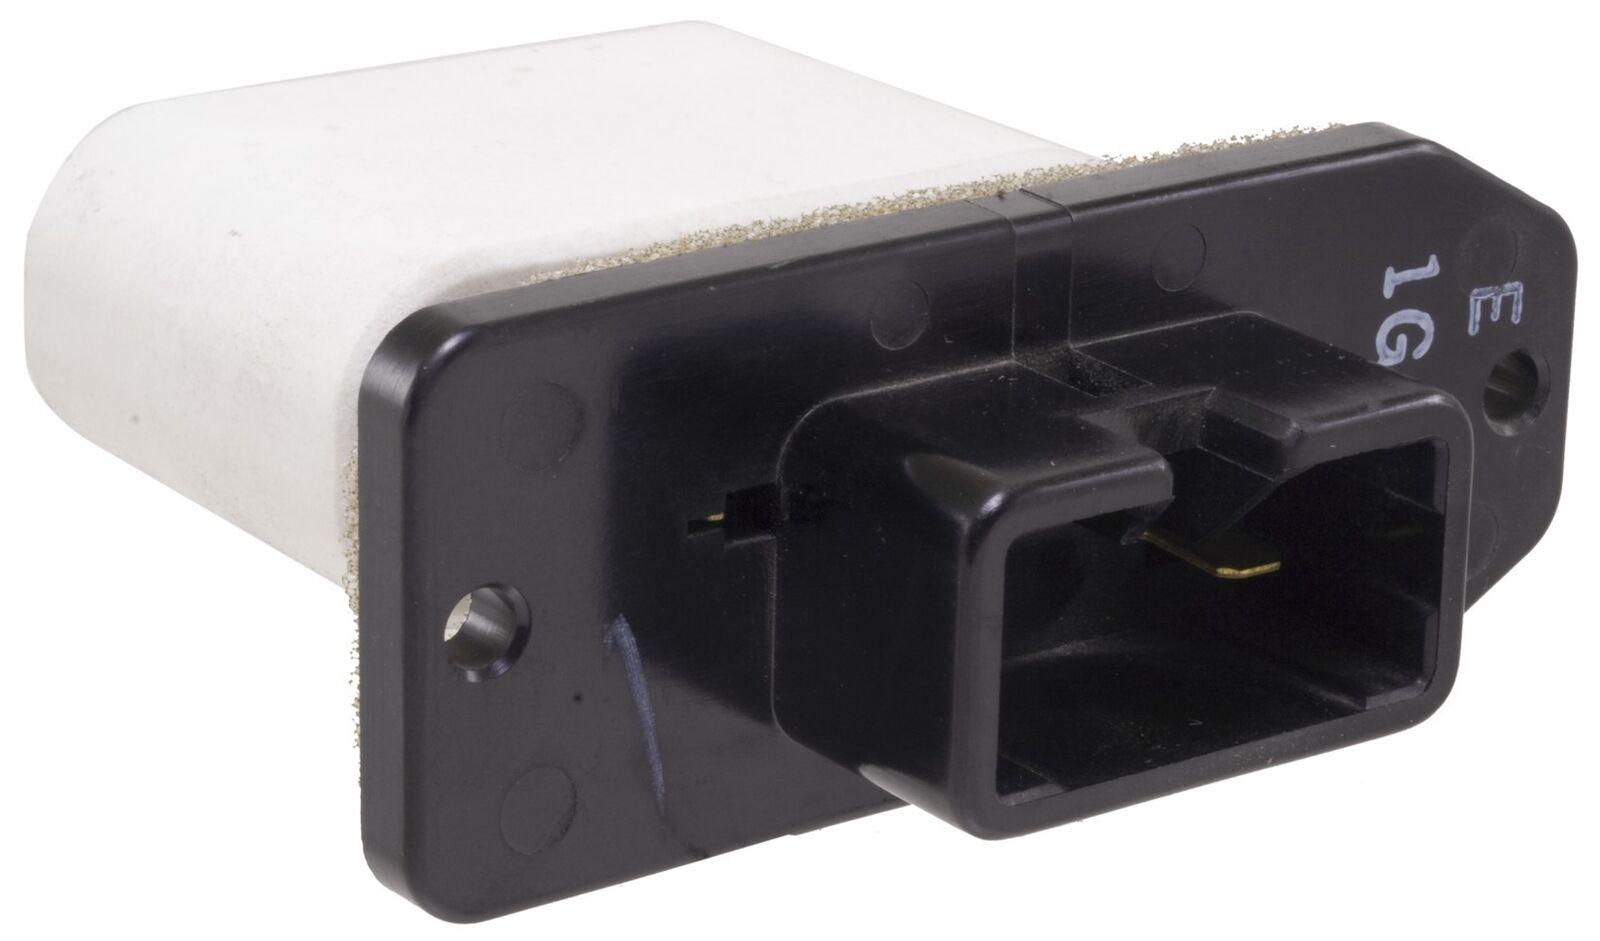 hvac blower motor resistor wells ja1331 fits 92 96 toyota camry ebay Camry Sedan stock photo